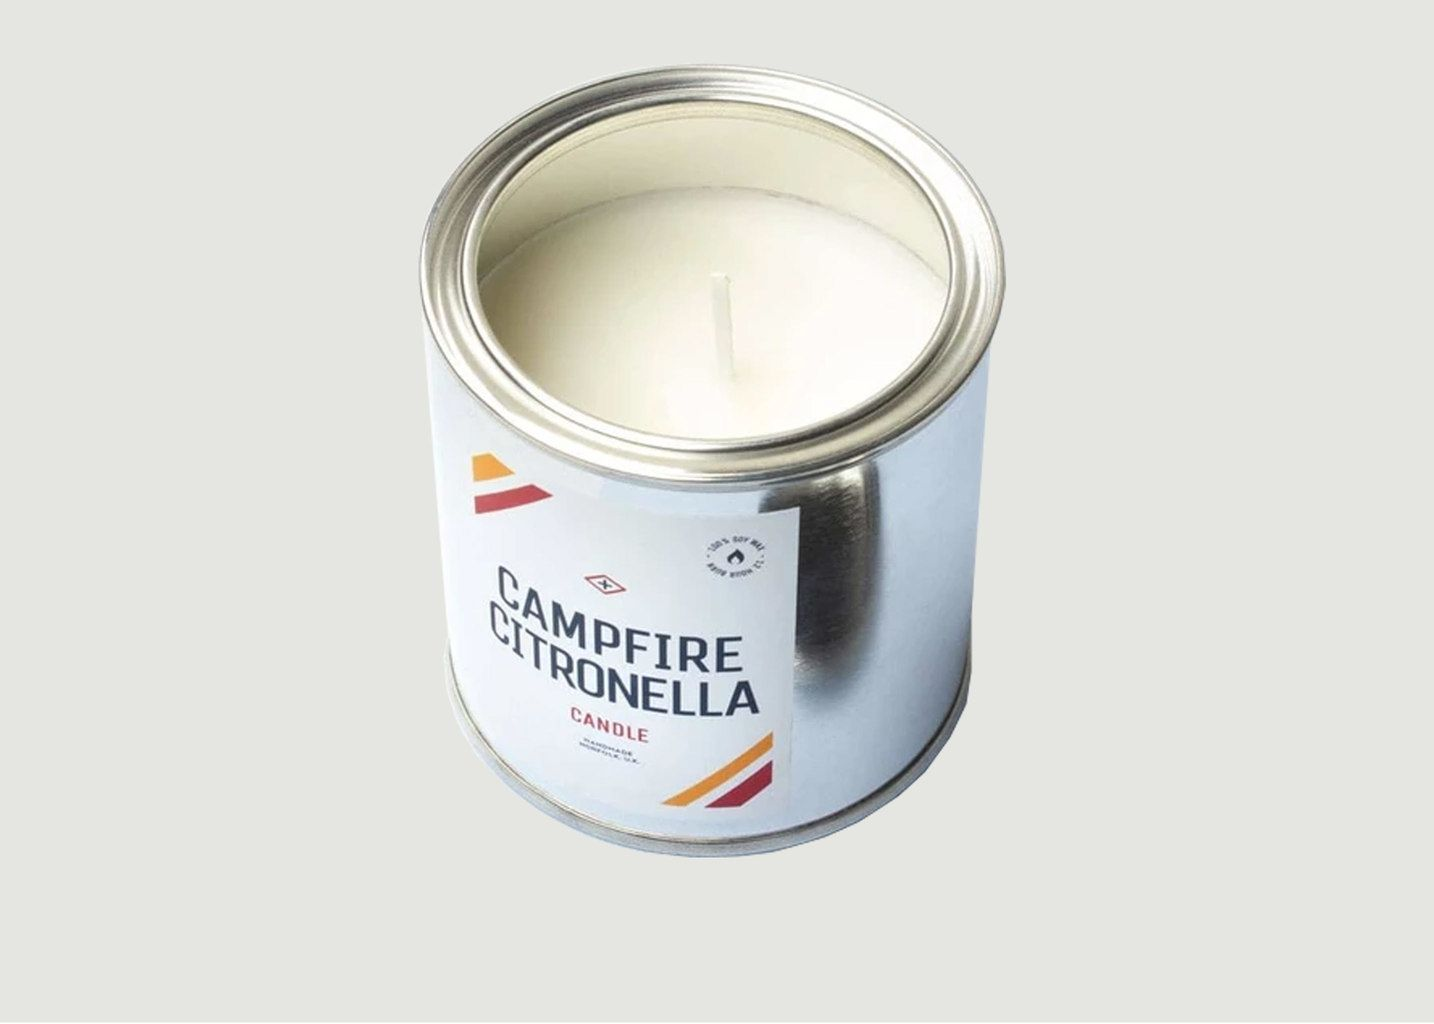 Bougie Pot Peinture Campfire Citronella - Men's Society